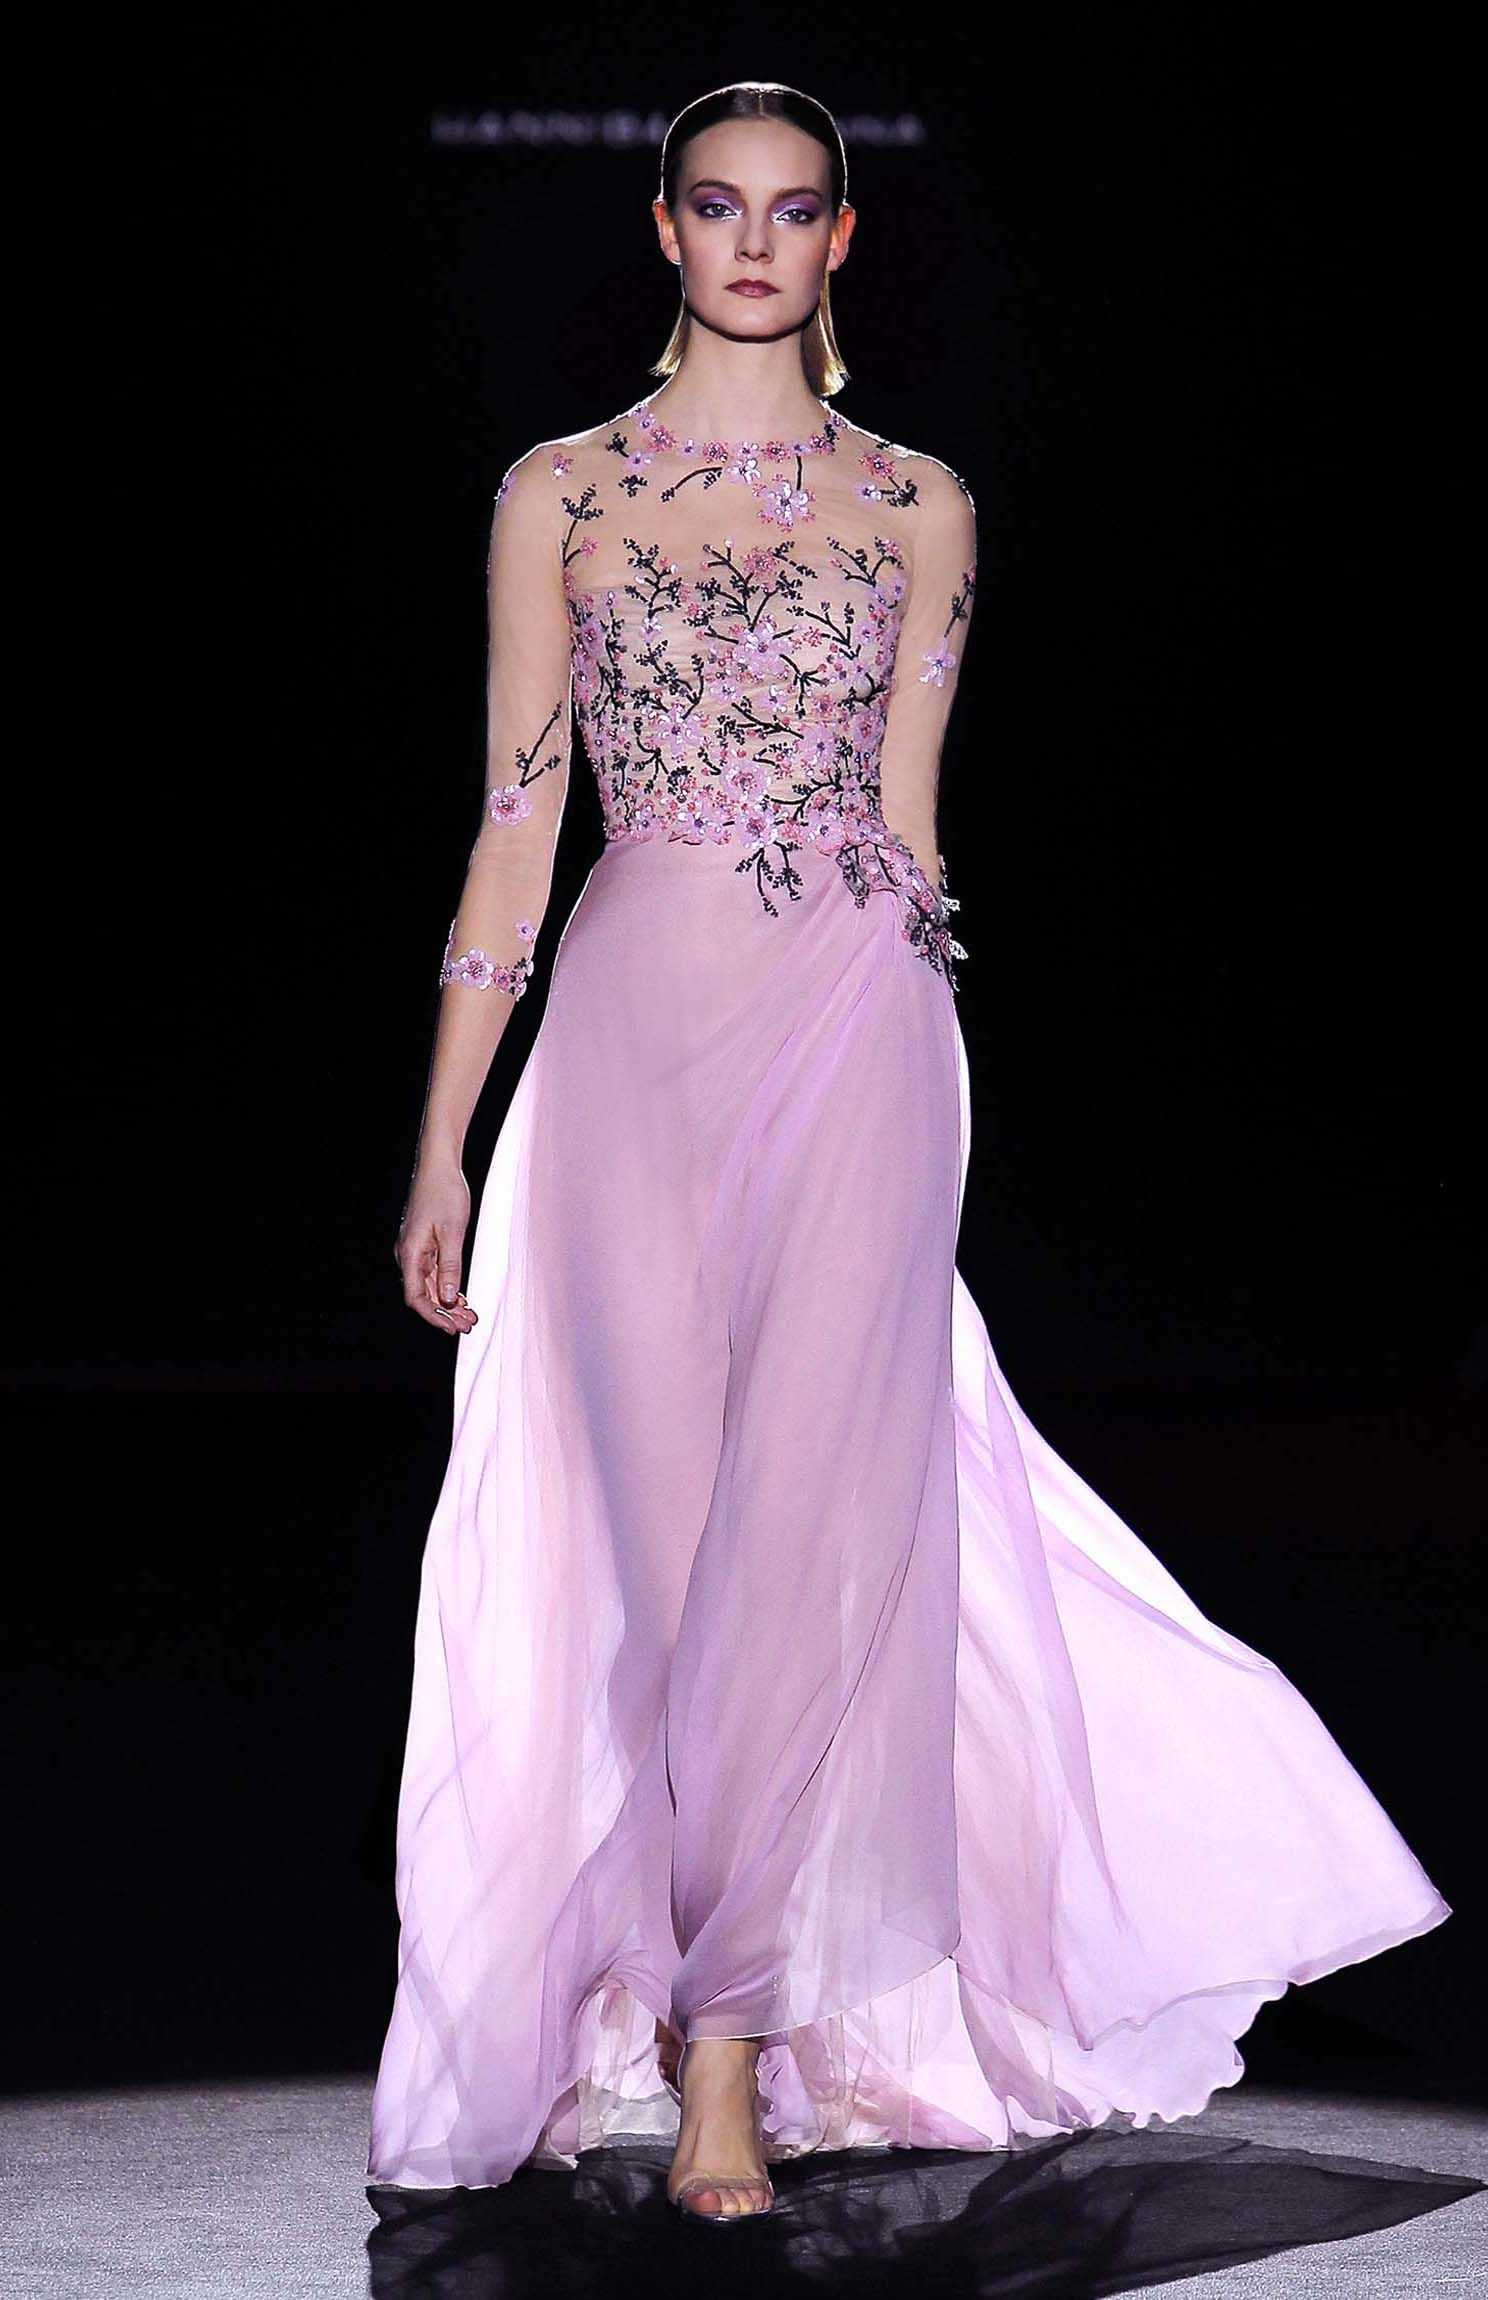 Hannibal Laguna Otoño Invierno 2019 2020 Glamorous Dresses Cocktail Evening Dresses Stunning Dresses